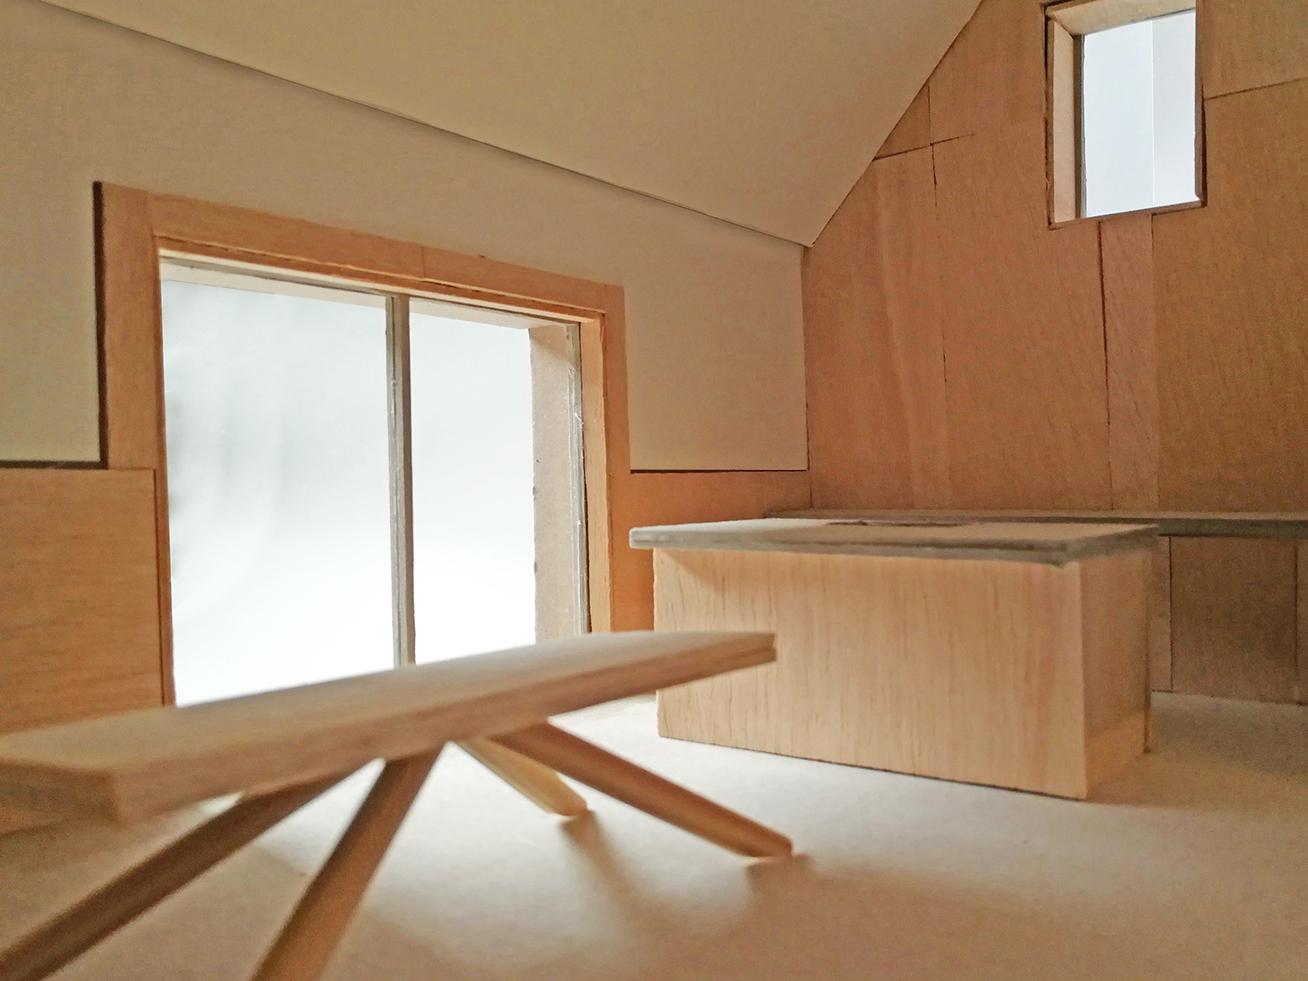 harper-perry-architects-arkangel-westerdale-barn-model-inside-kitchen-dining